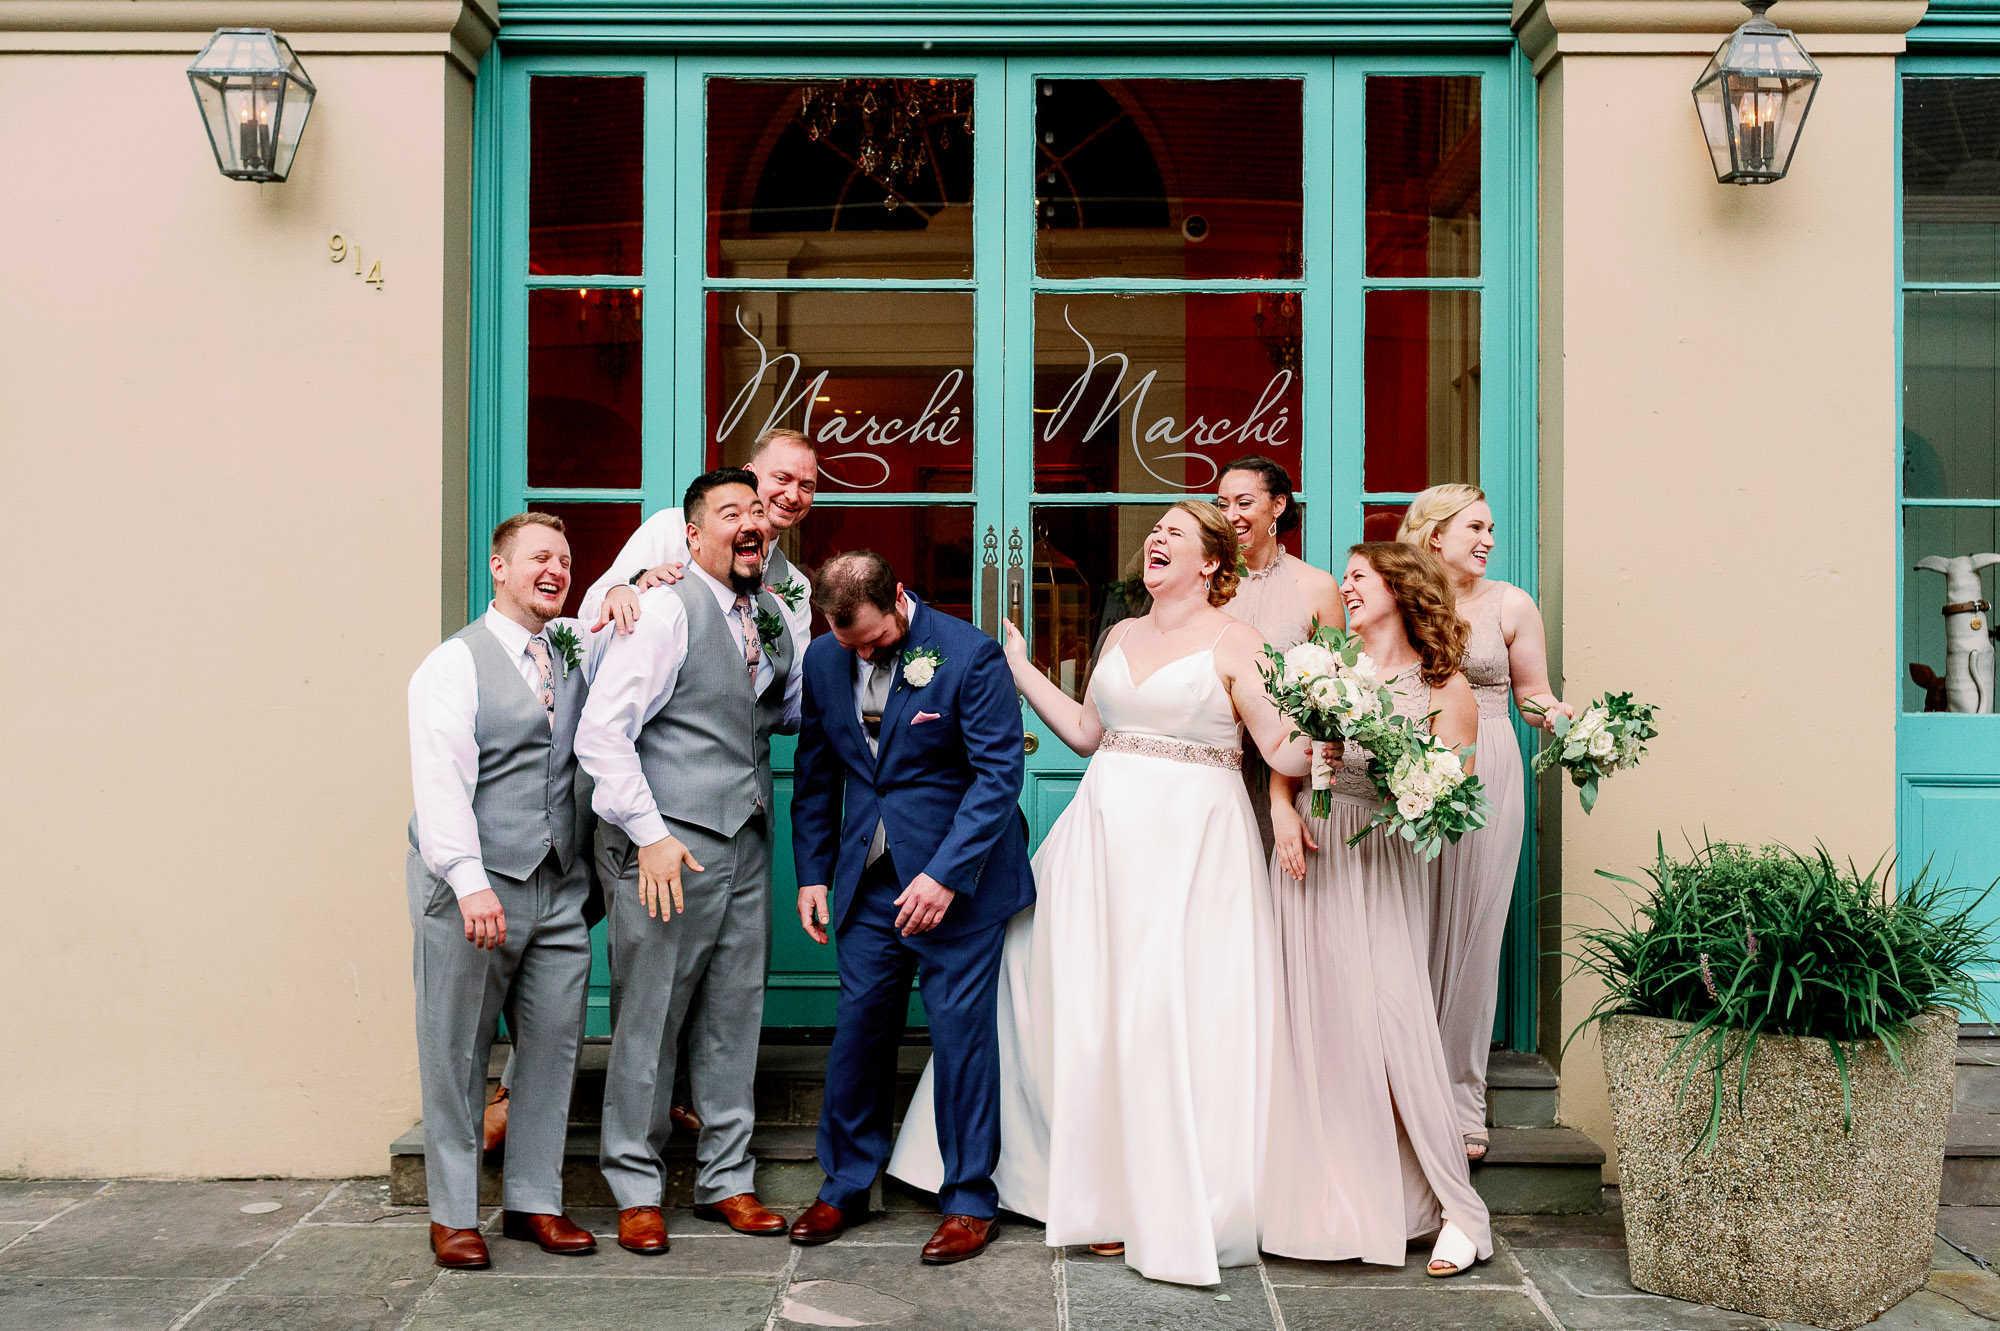 Marche New Orleans Wedding Venue Photographer (35).jpg